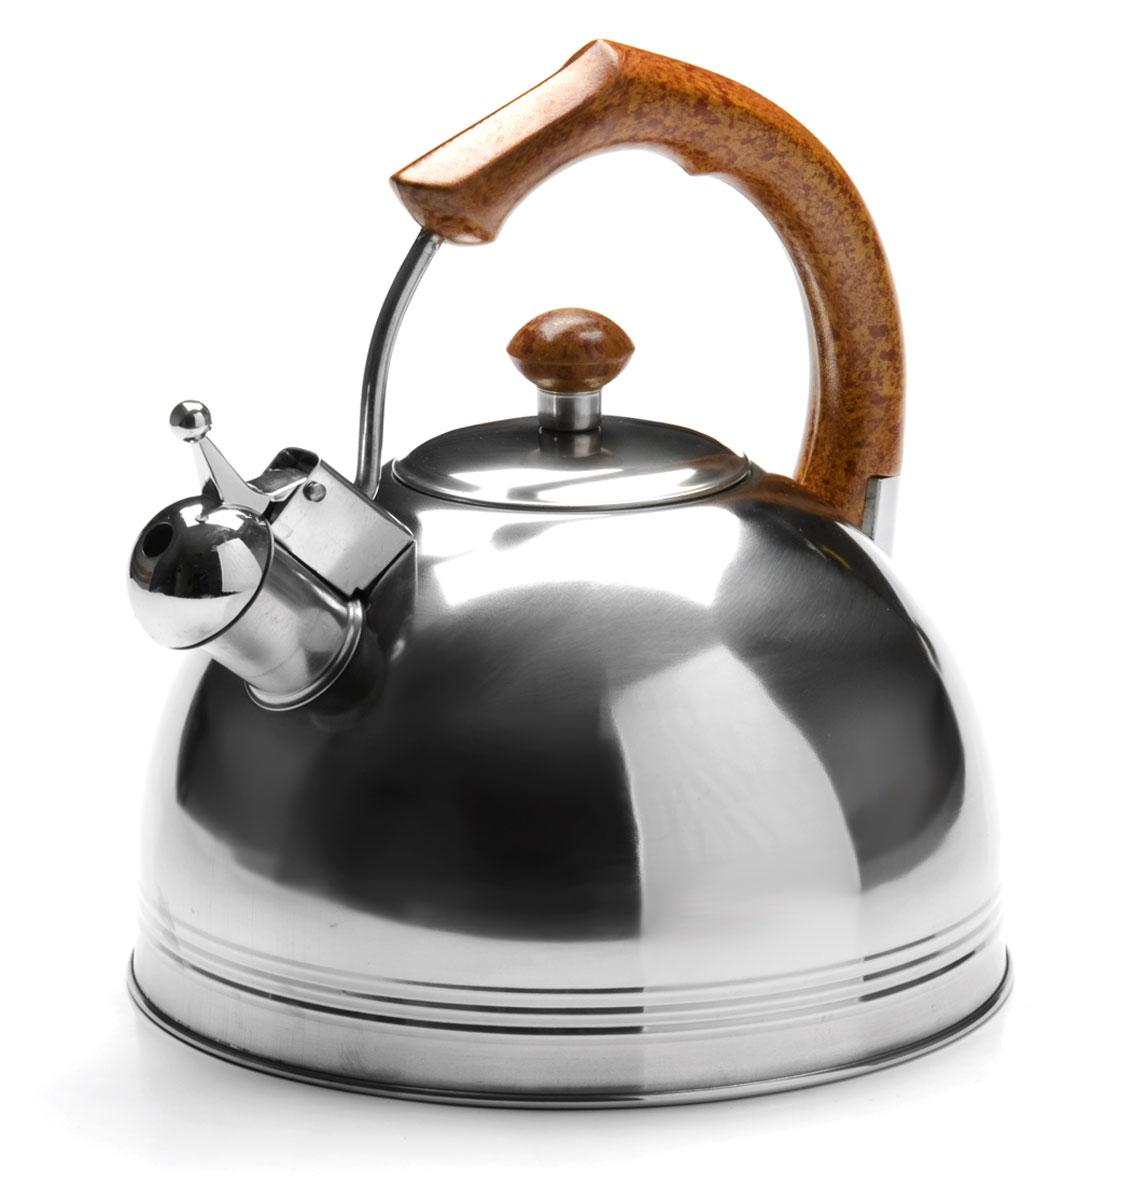 Чайник Mayer & Boch, со свистком, 4,8 л. 2616926169